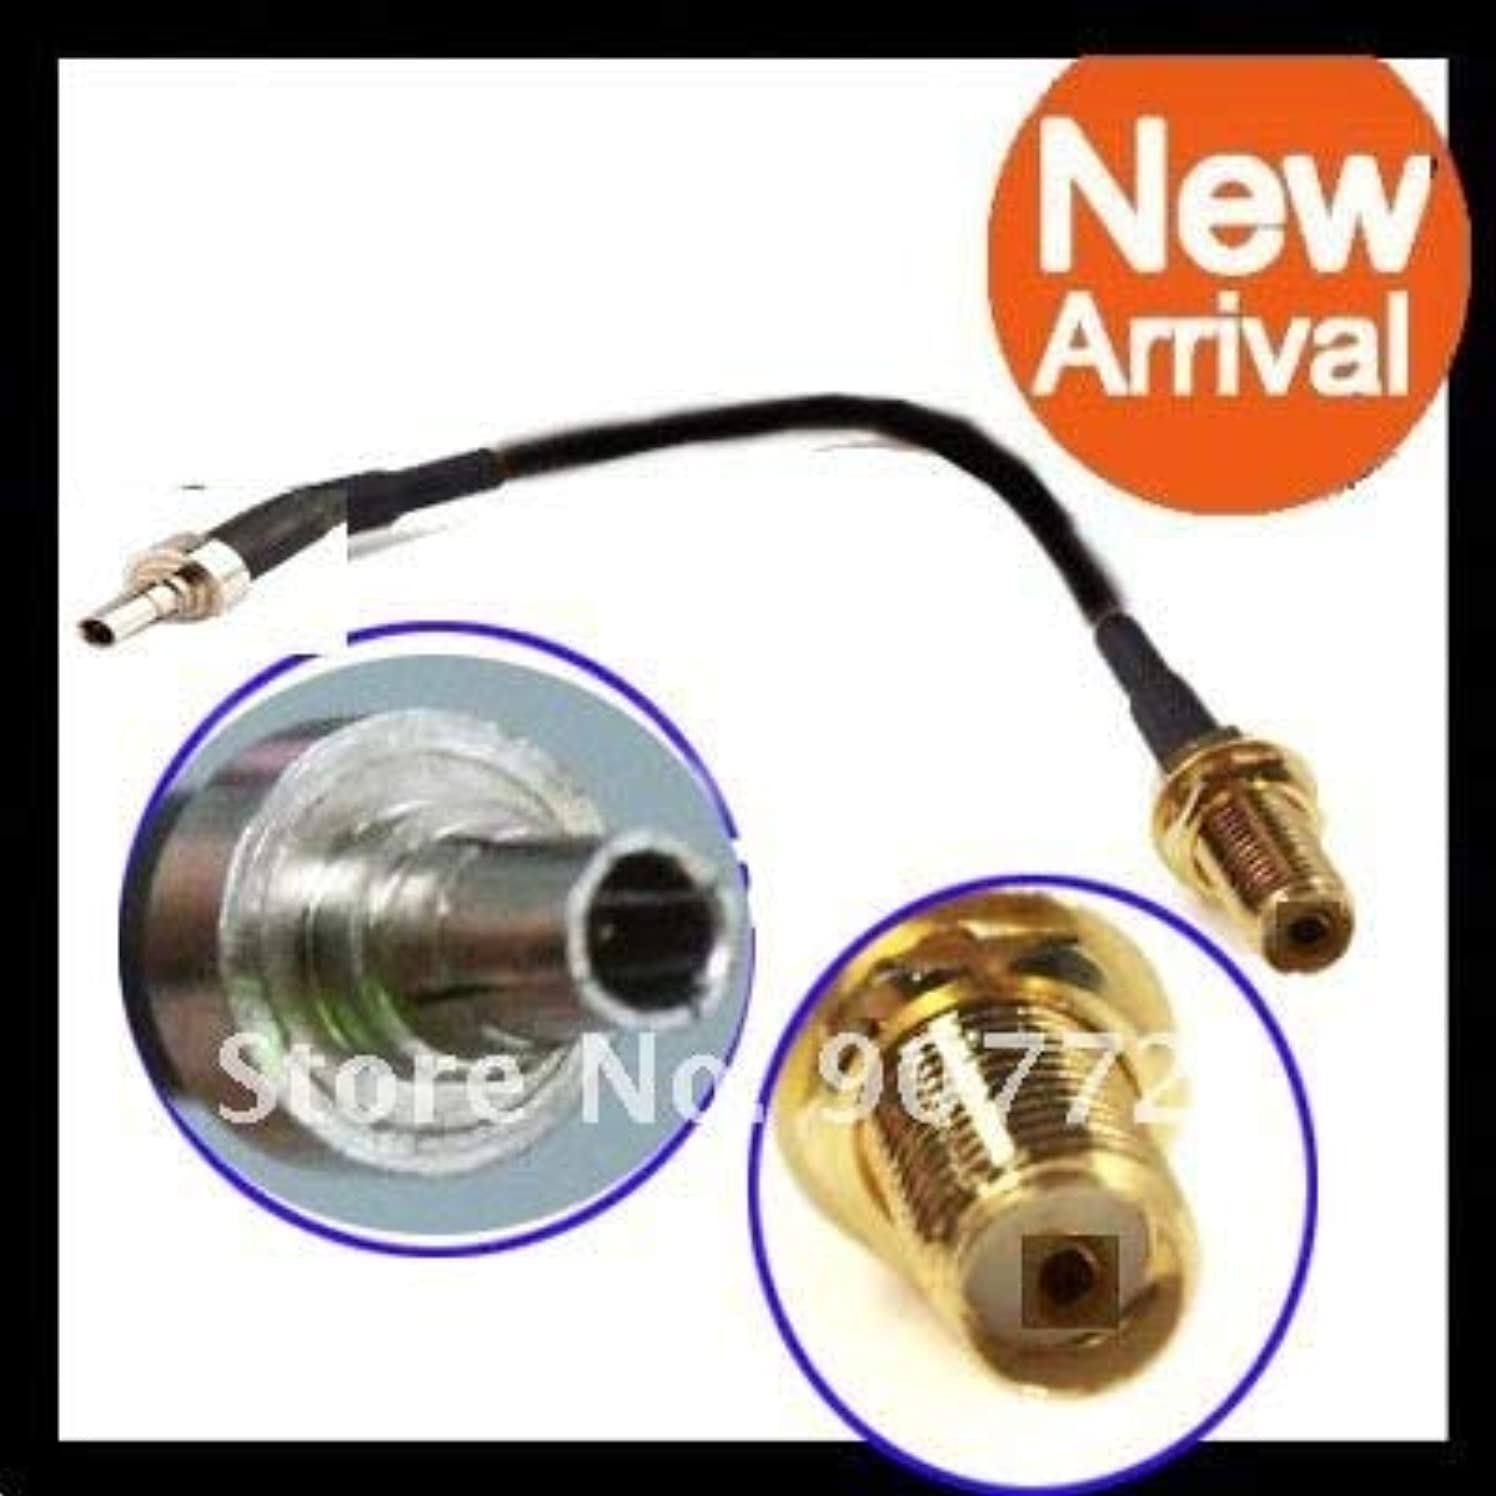 Gimax 10PCS CRC9 Male Plug To SMA Jack Female RG174 3G Huawei Modem Jump Cable 18cm